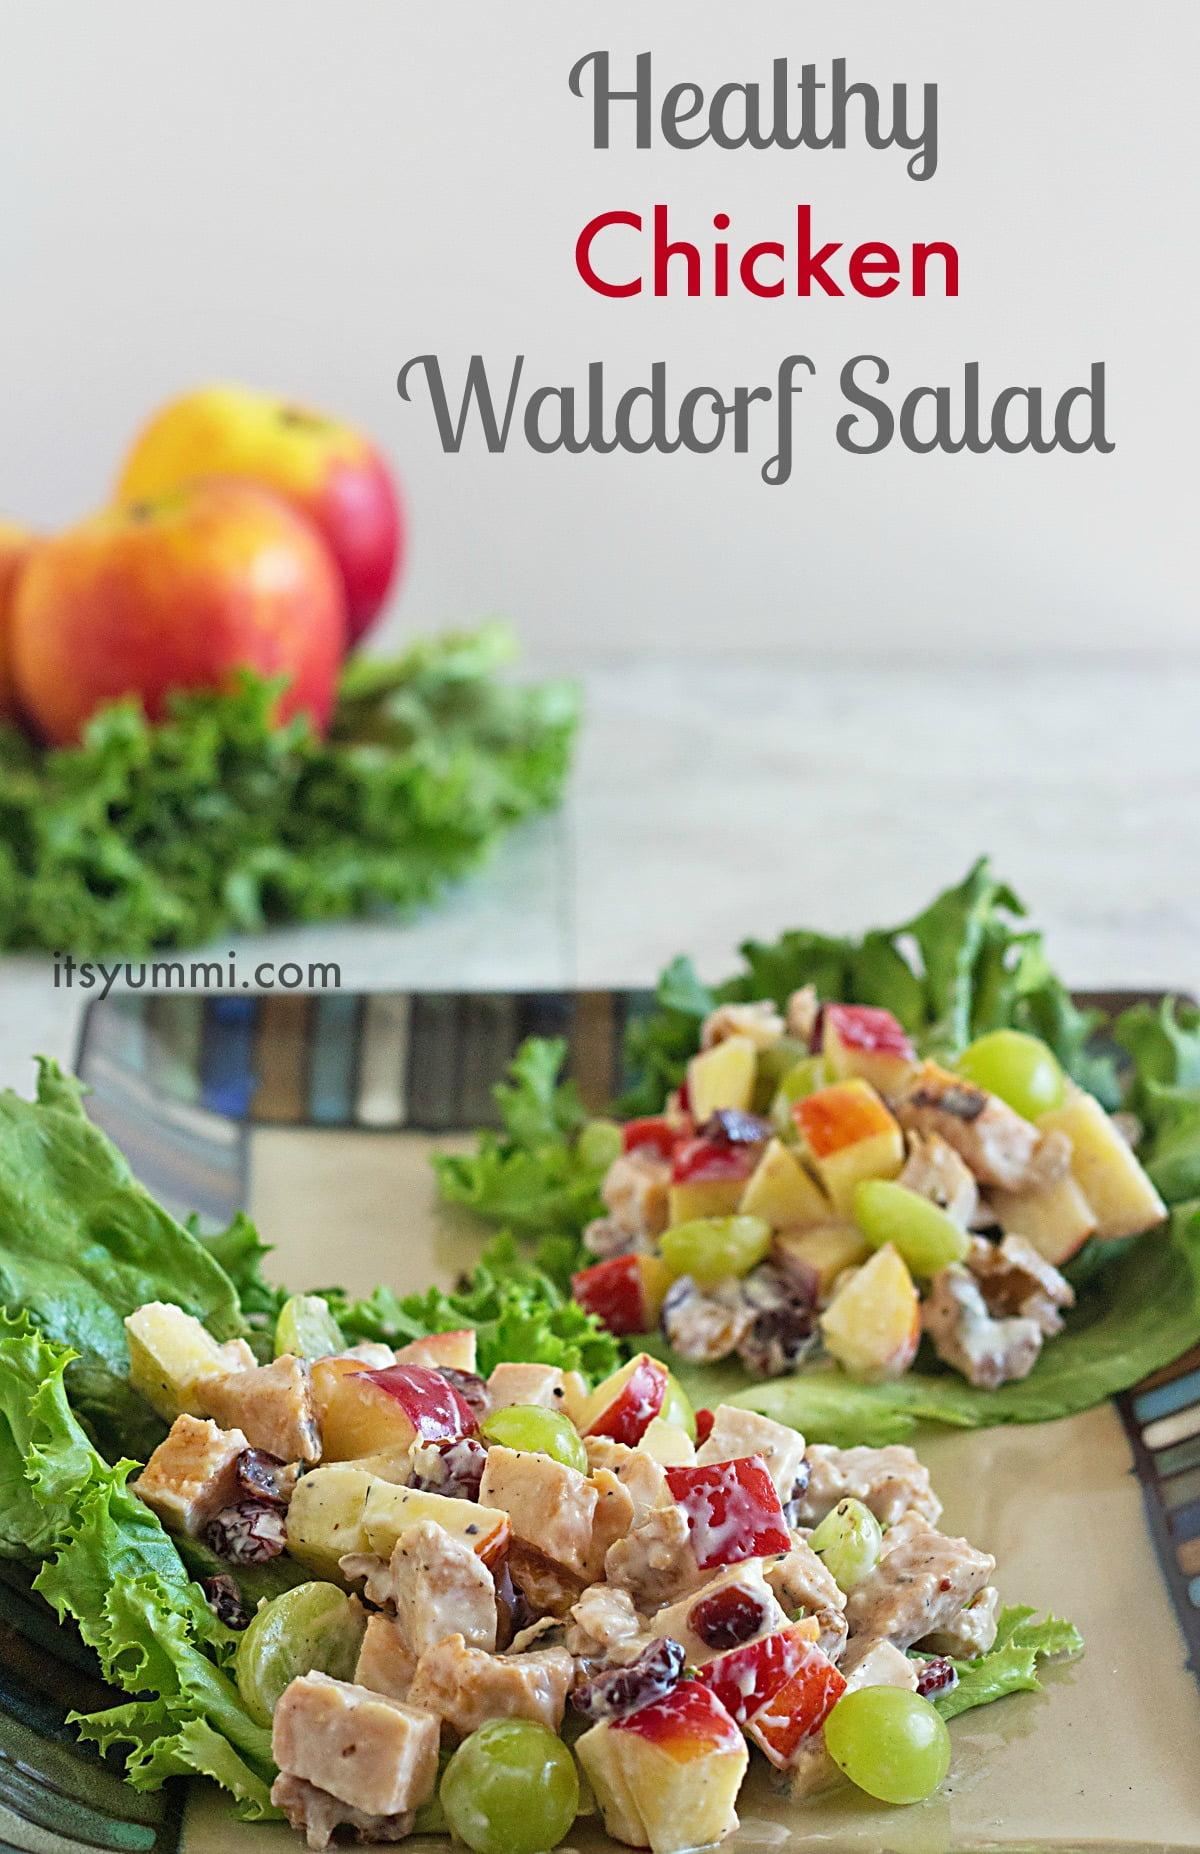 Healthy Chicken Waldorf Salad Recipe ⋆ Its Yummi